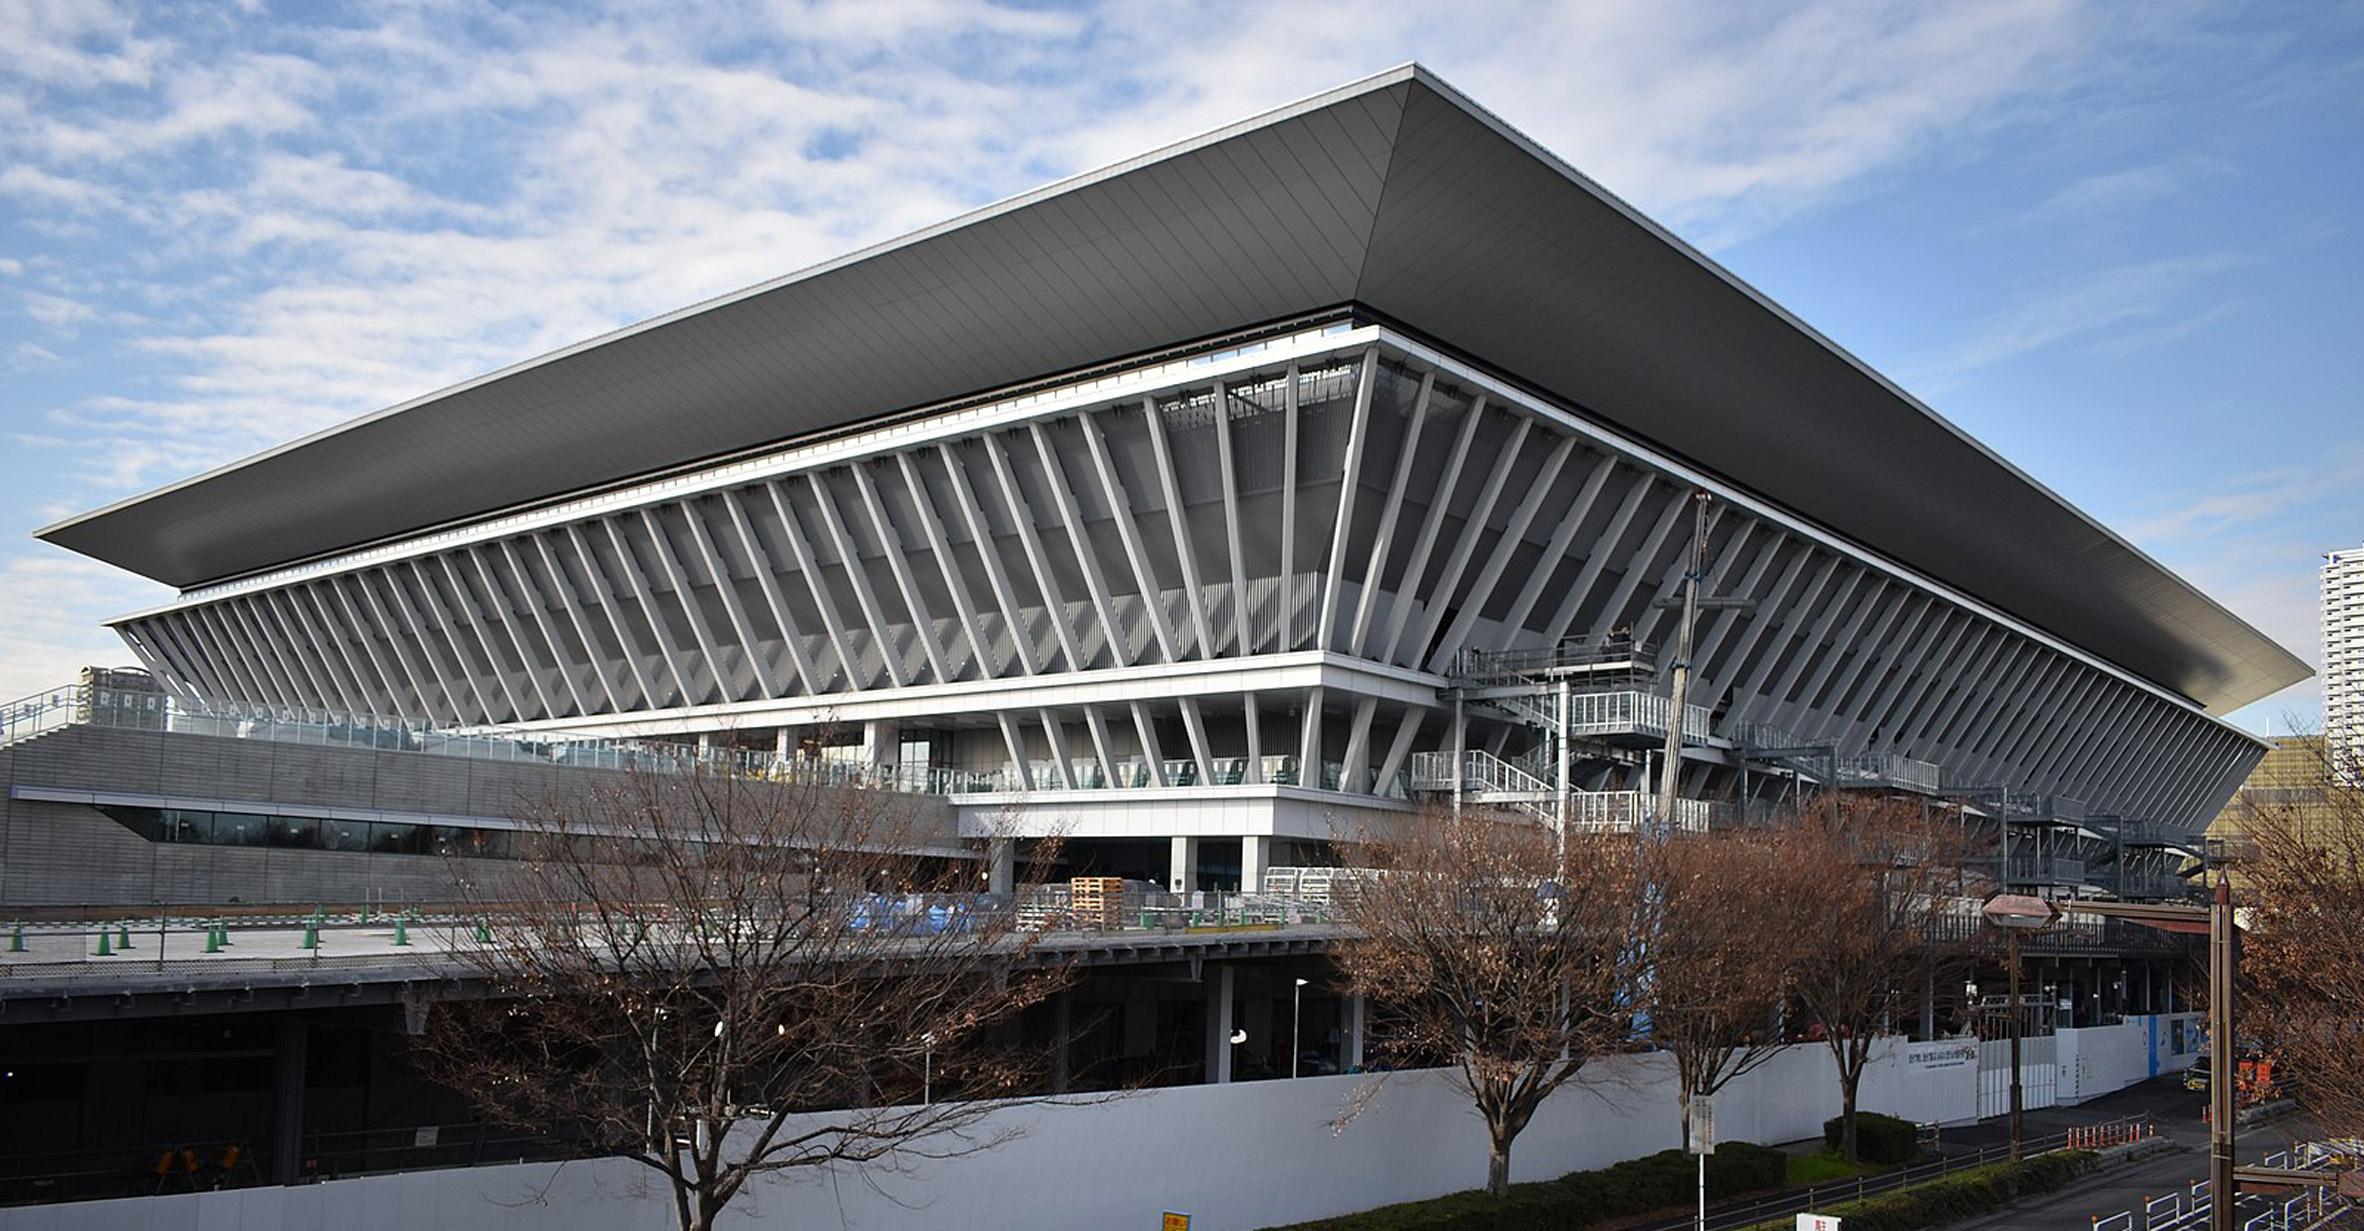 Tokyo Aquatics Centre by Yamashita Sekkei and Tange Associates